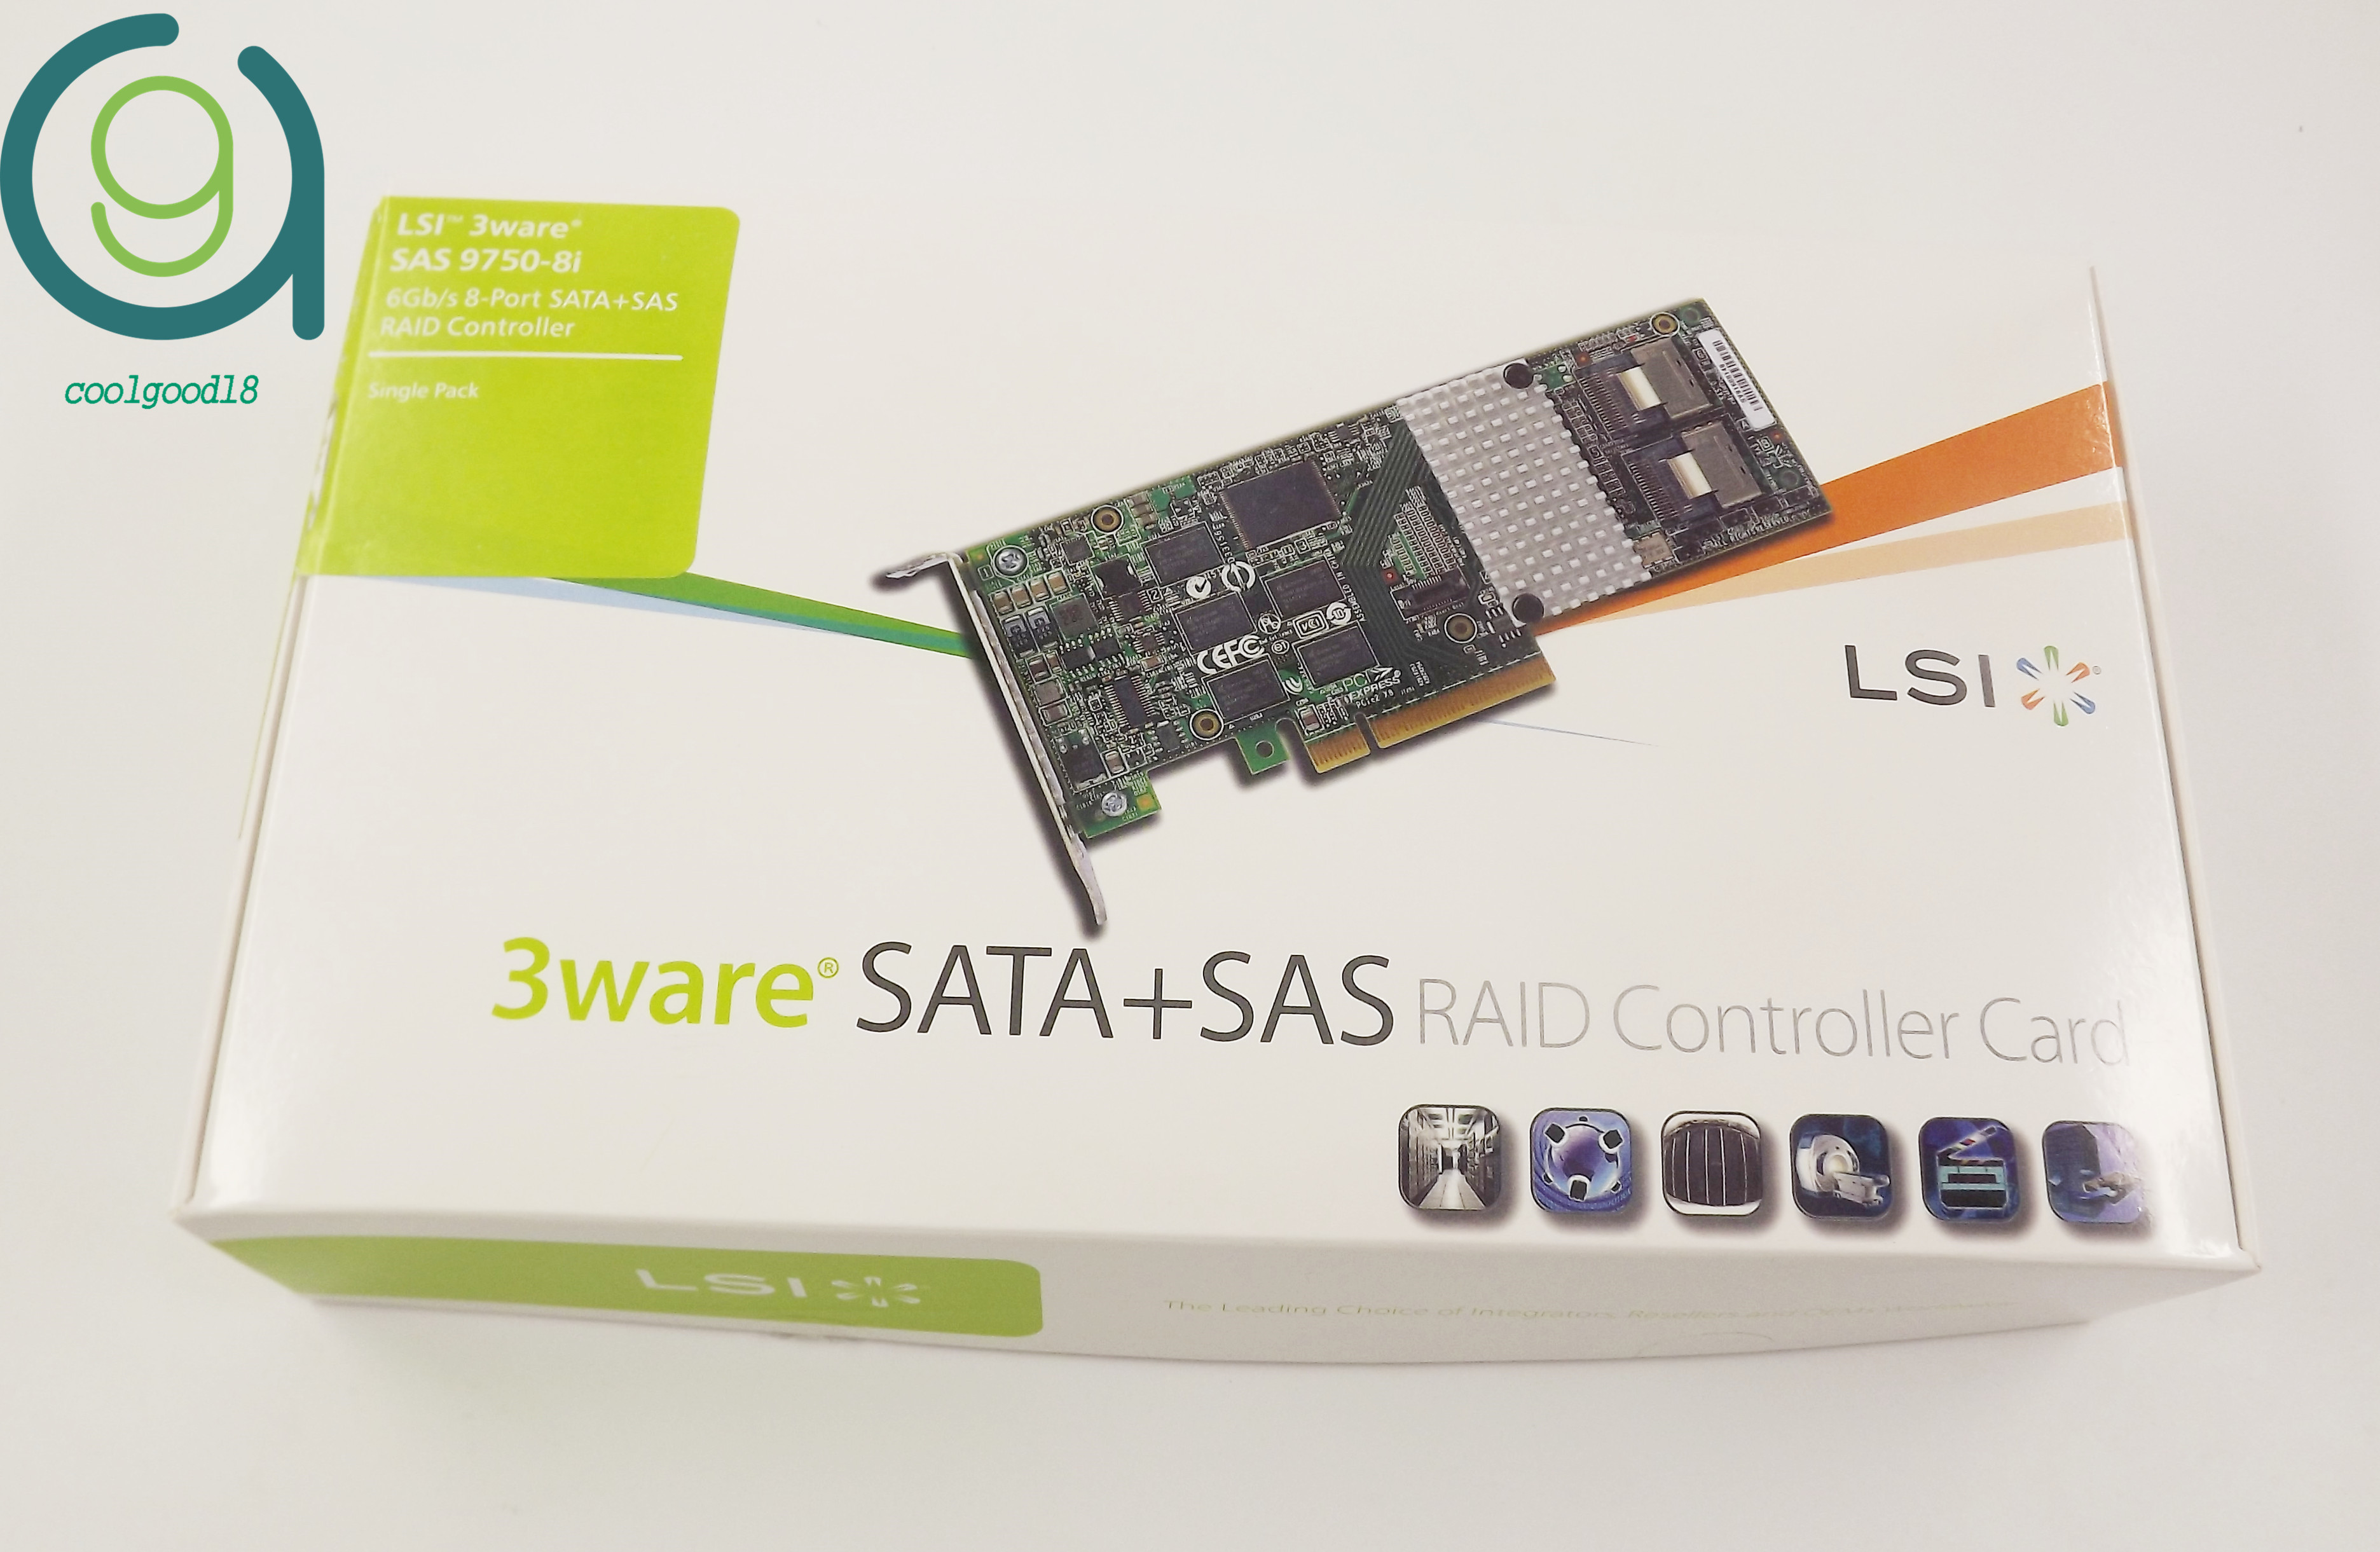 Details about 9750-8i 8-port PCI-E SAS For LSI LSI00213 RAID Controller Card